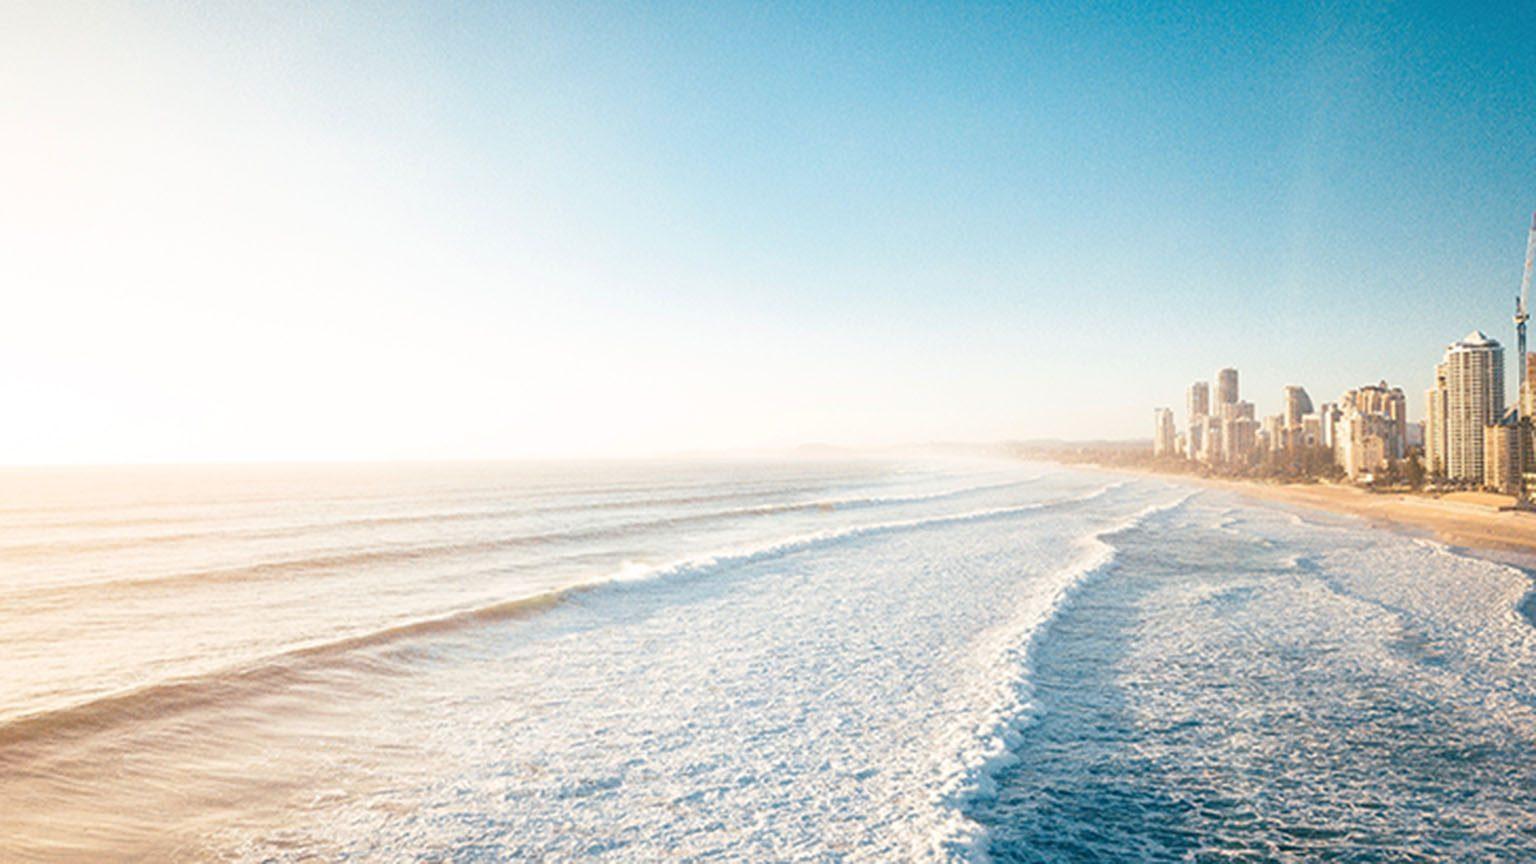 Photo Taken In Surfers Paradise, Australia